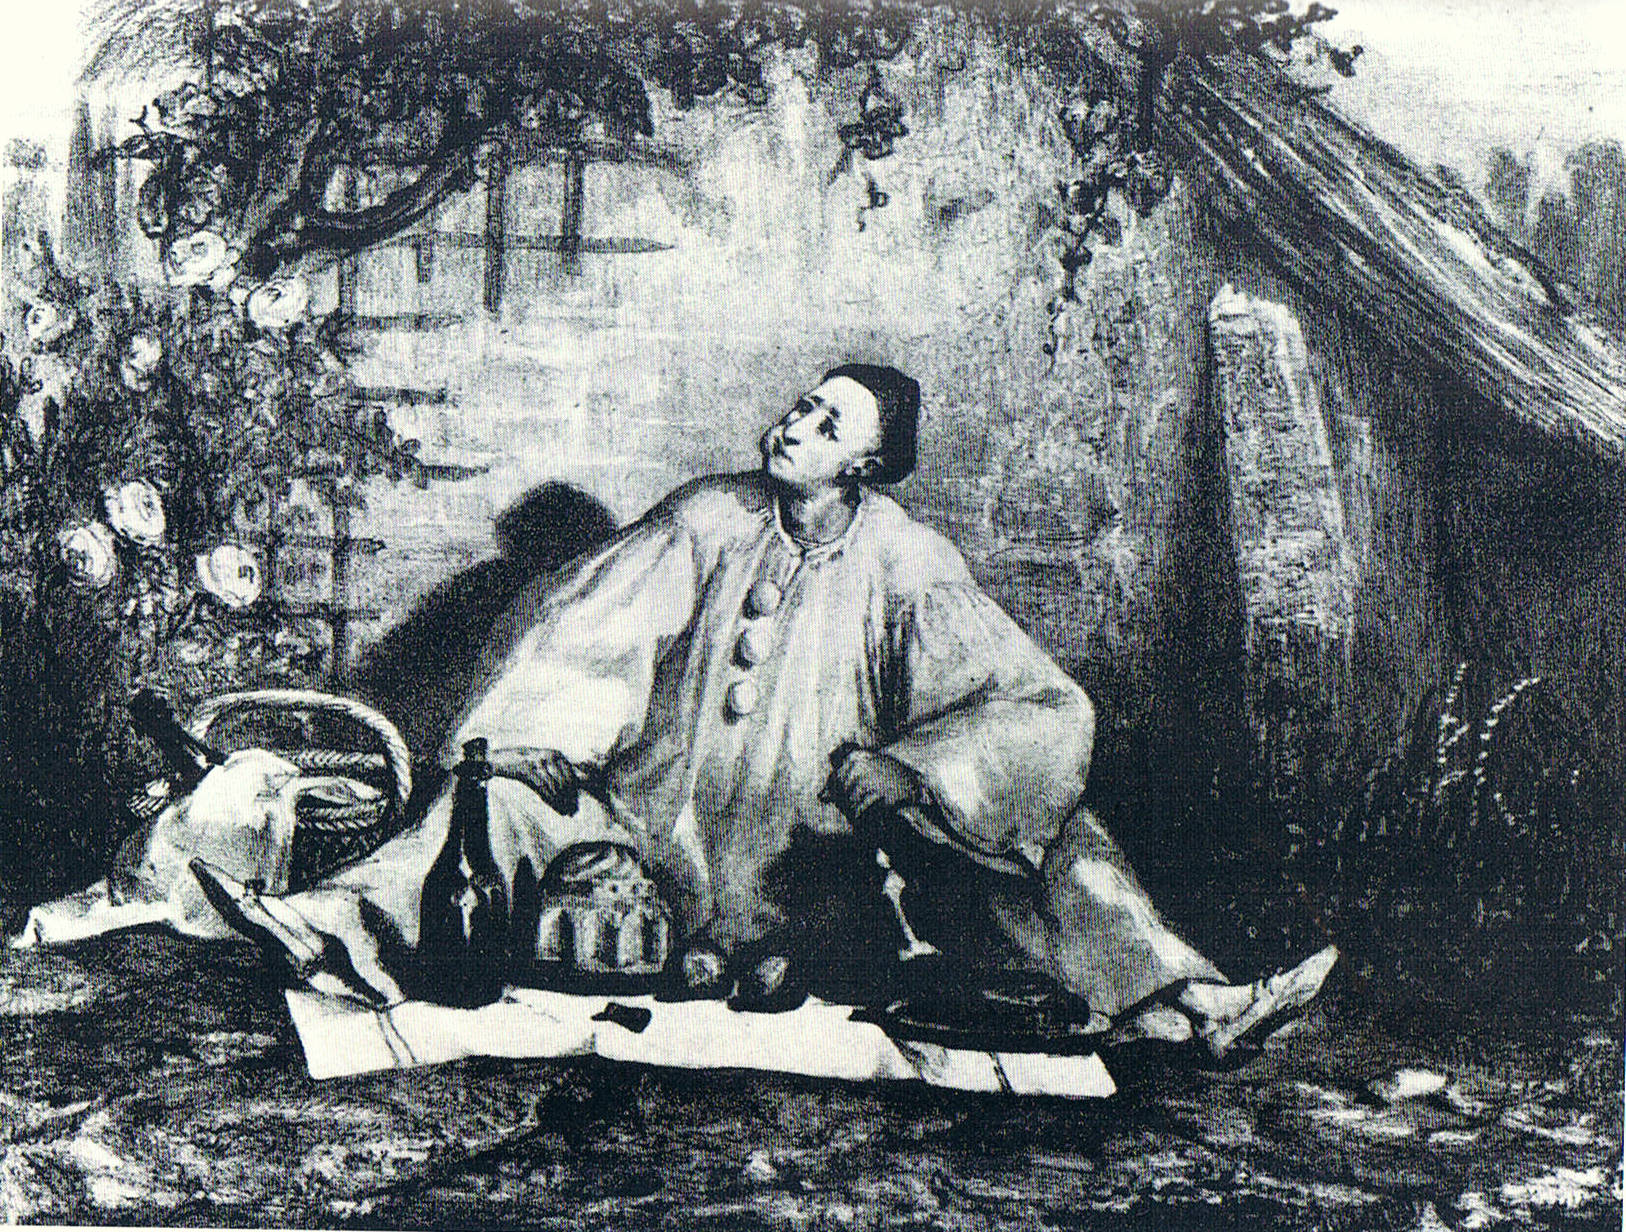 Jean-Gaspard Deburau